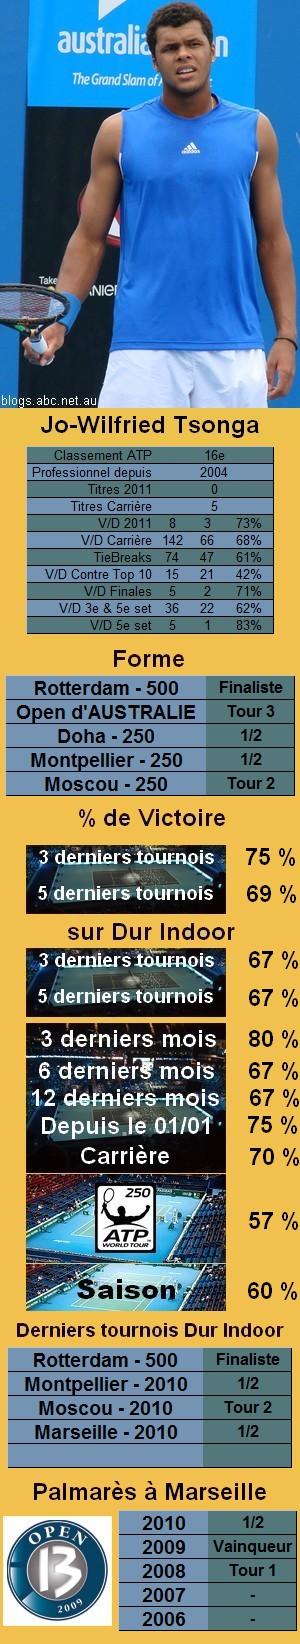 Statistiques tennis Jo Wilfried Tsonga